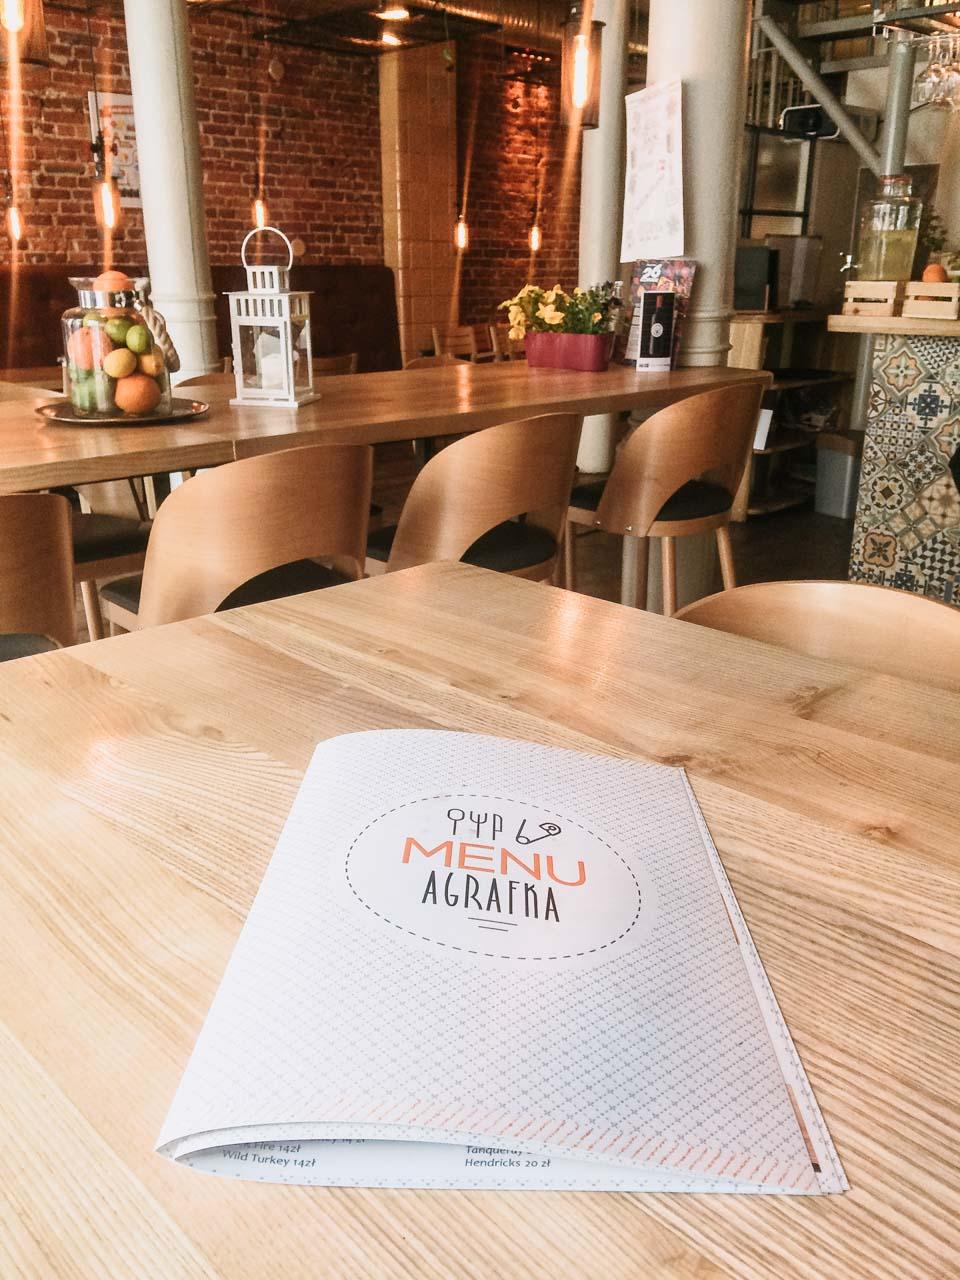 The inside of Agrafka in Łódź, Poland